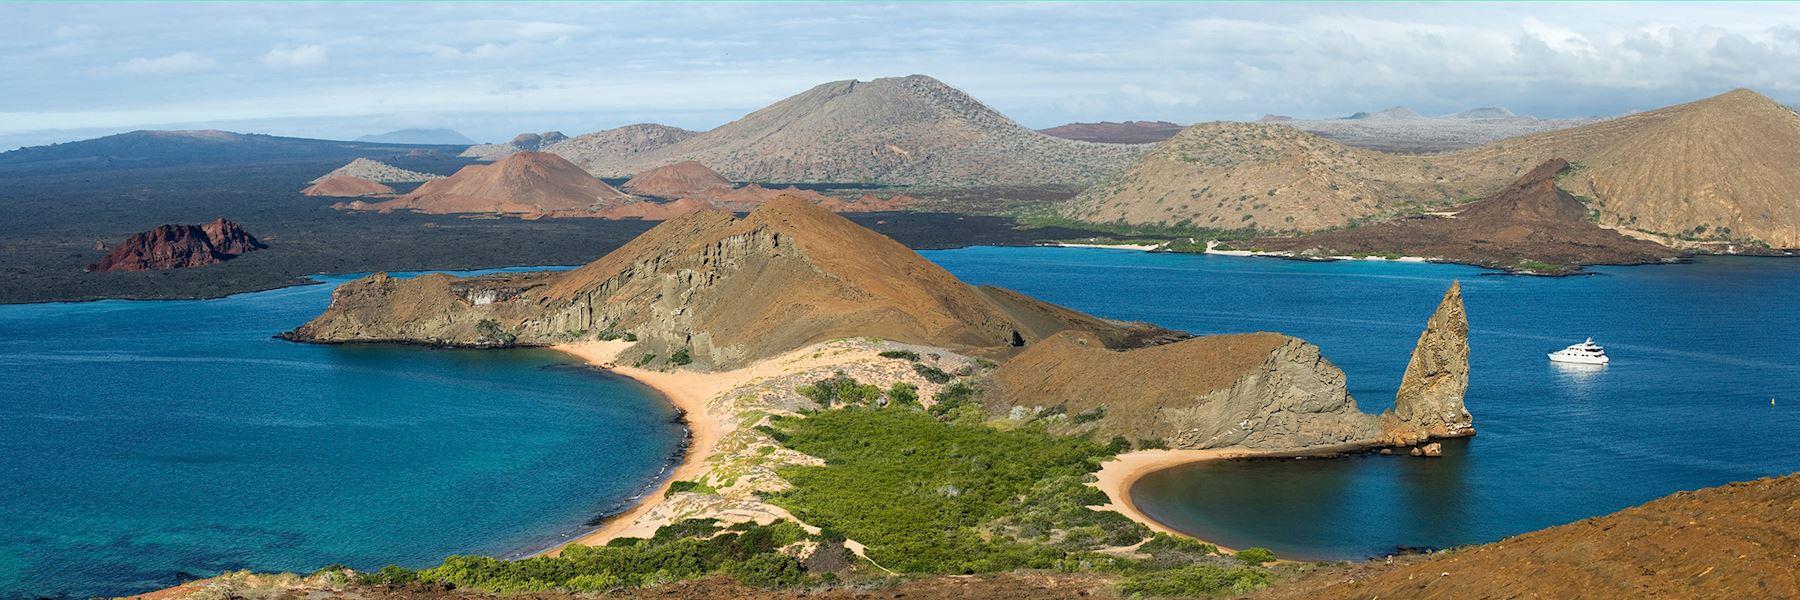 Galapagos Islands travel guides